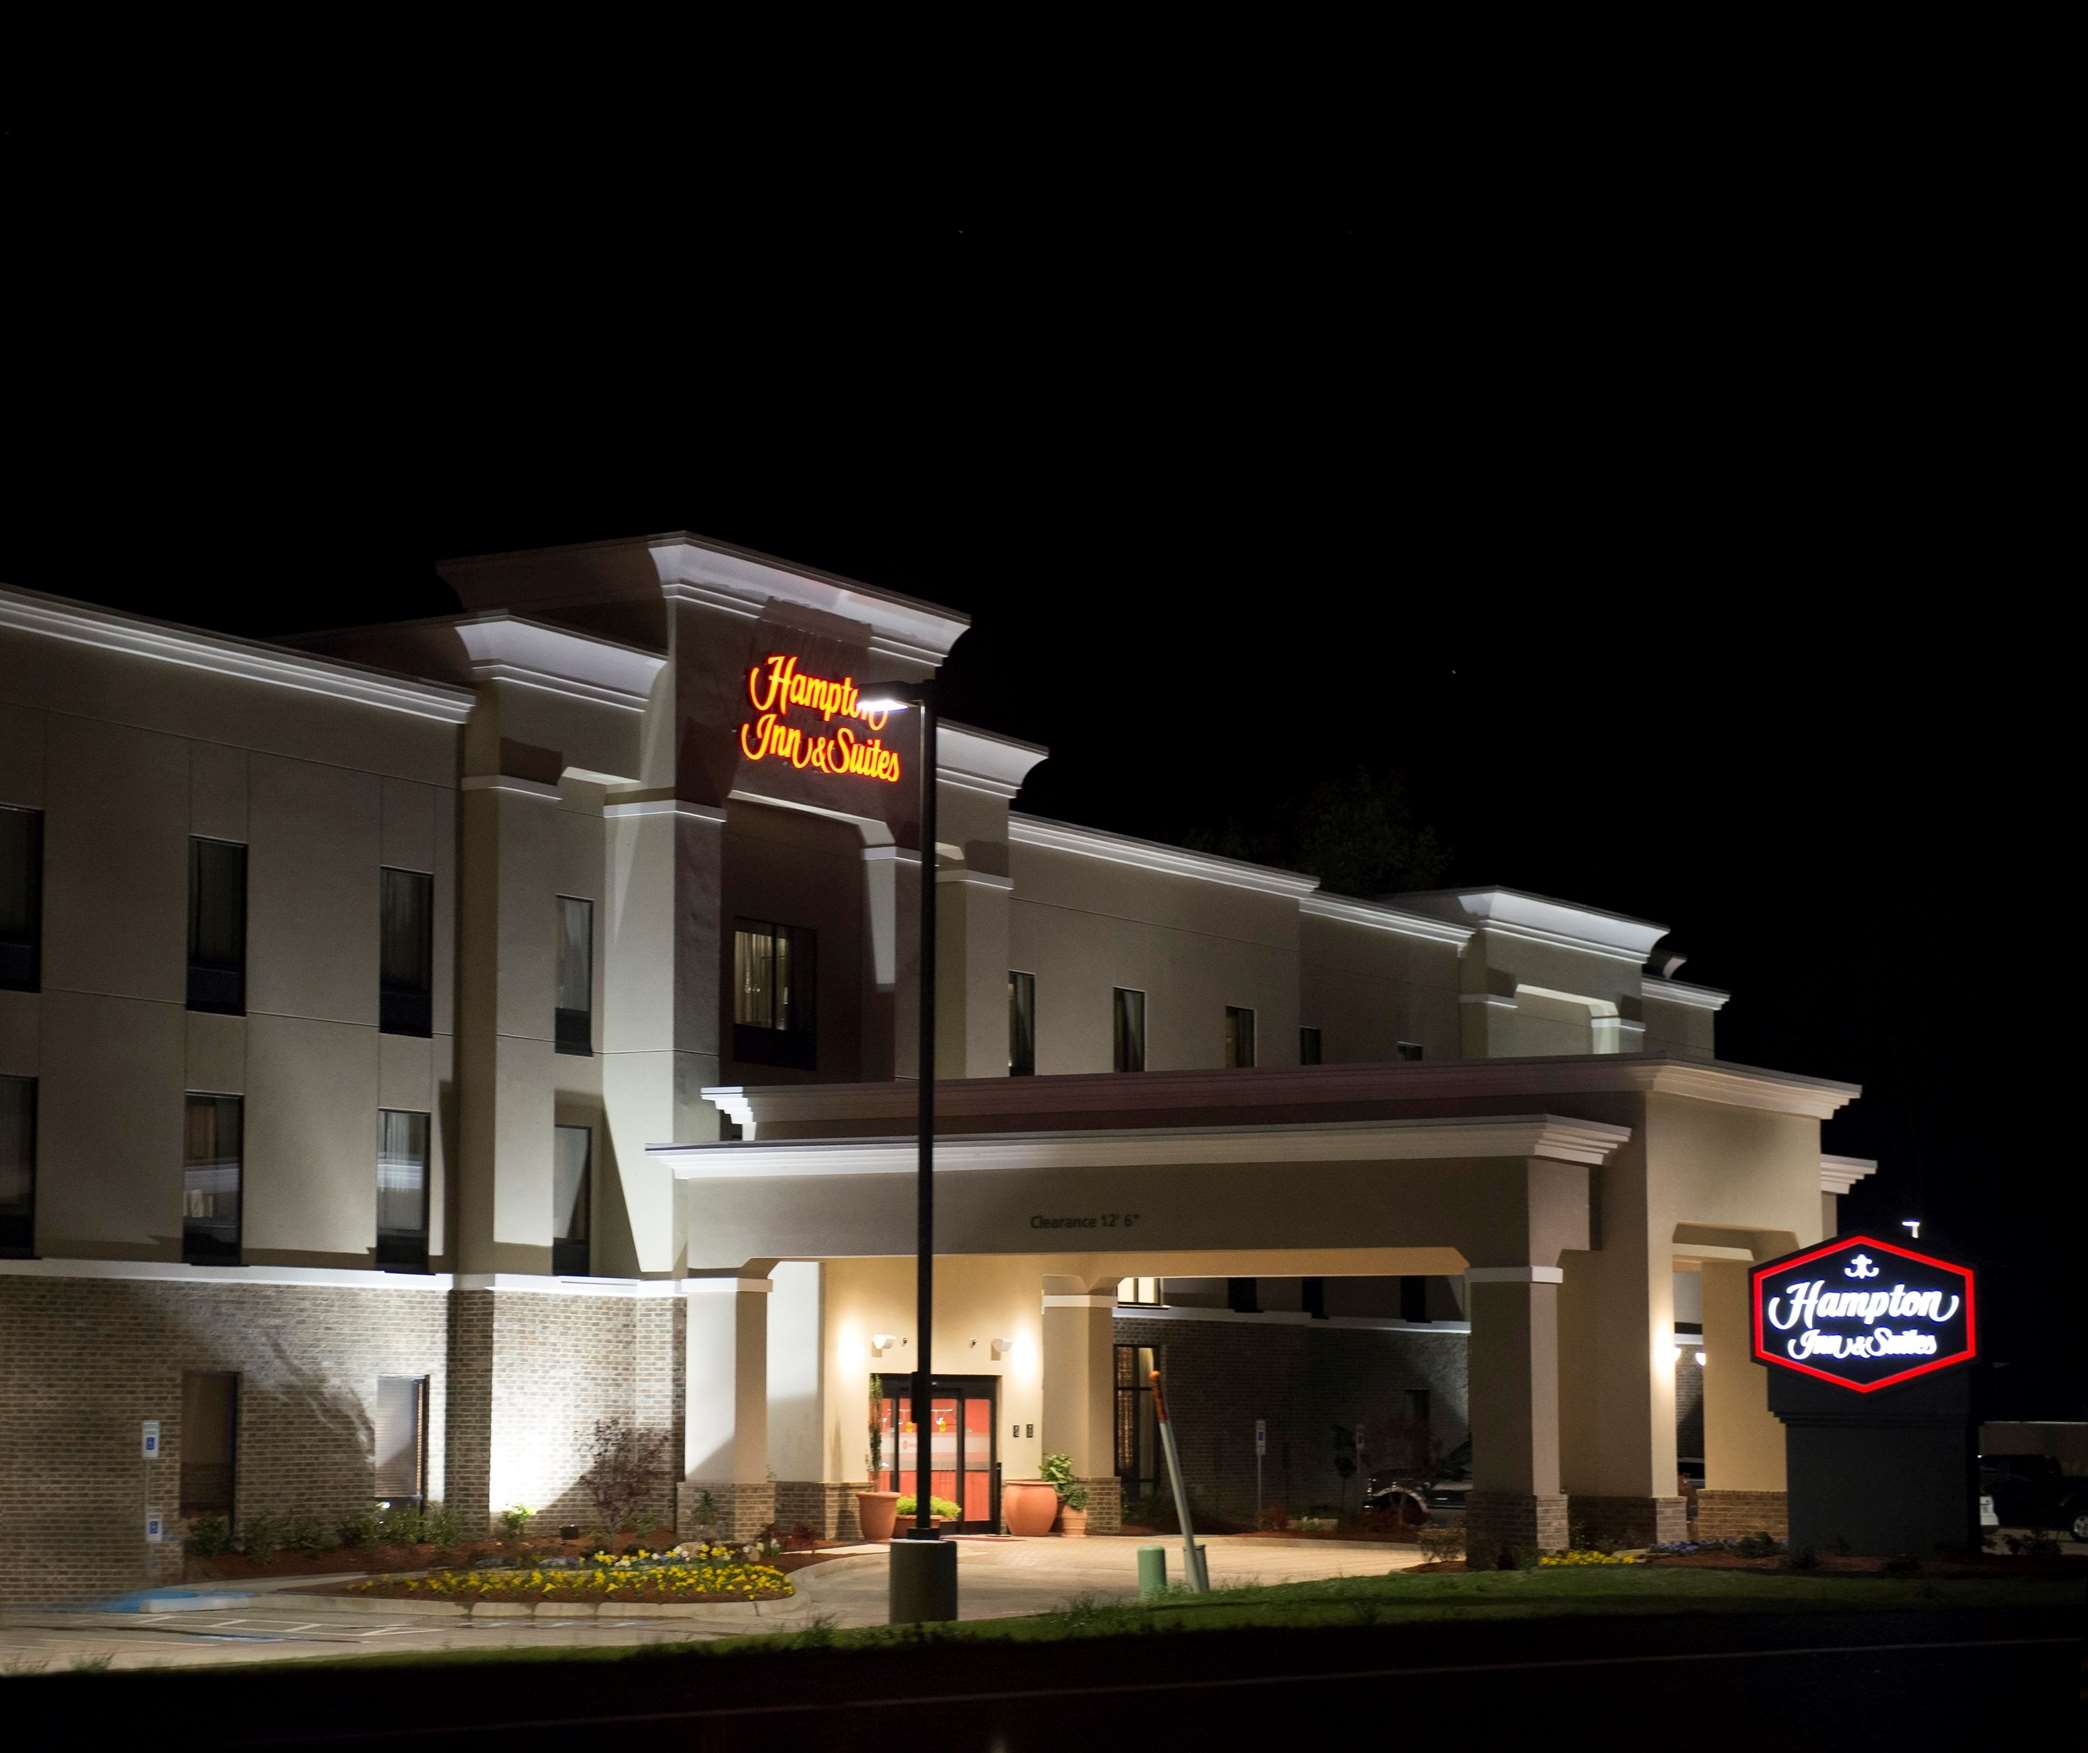 Hampton Inn & Suites Hope image 28